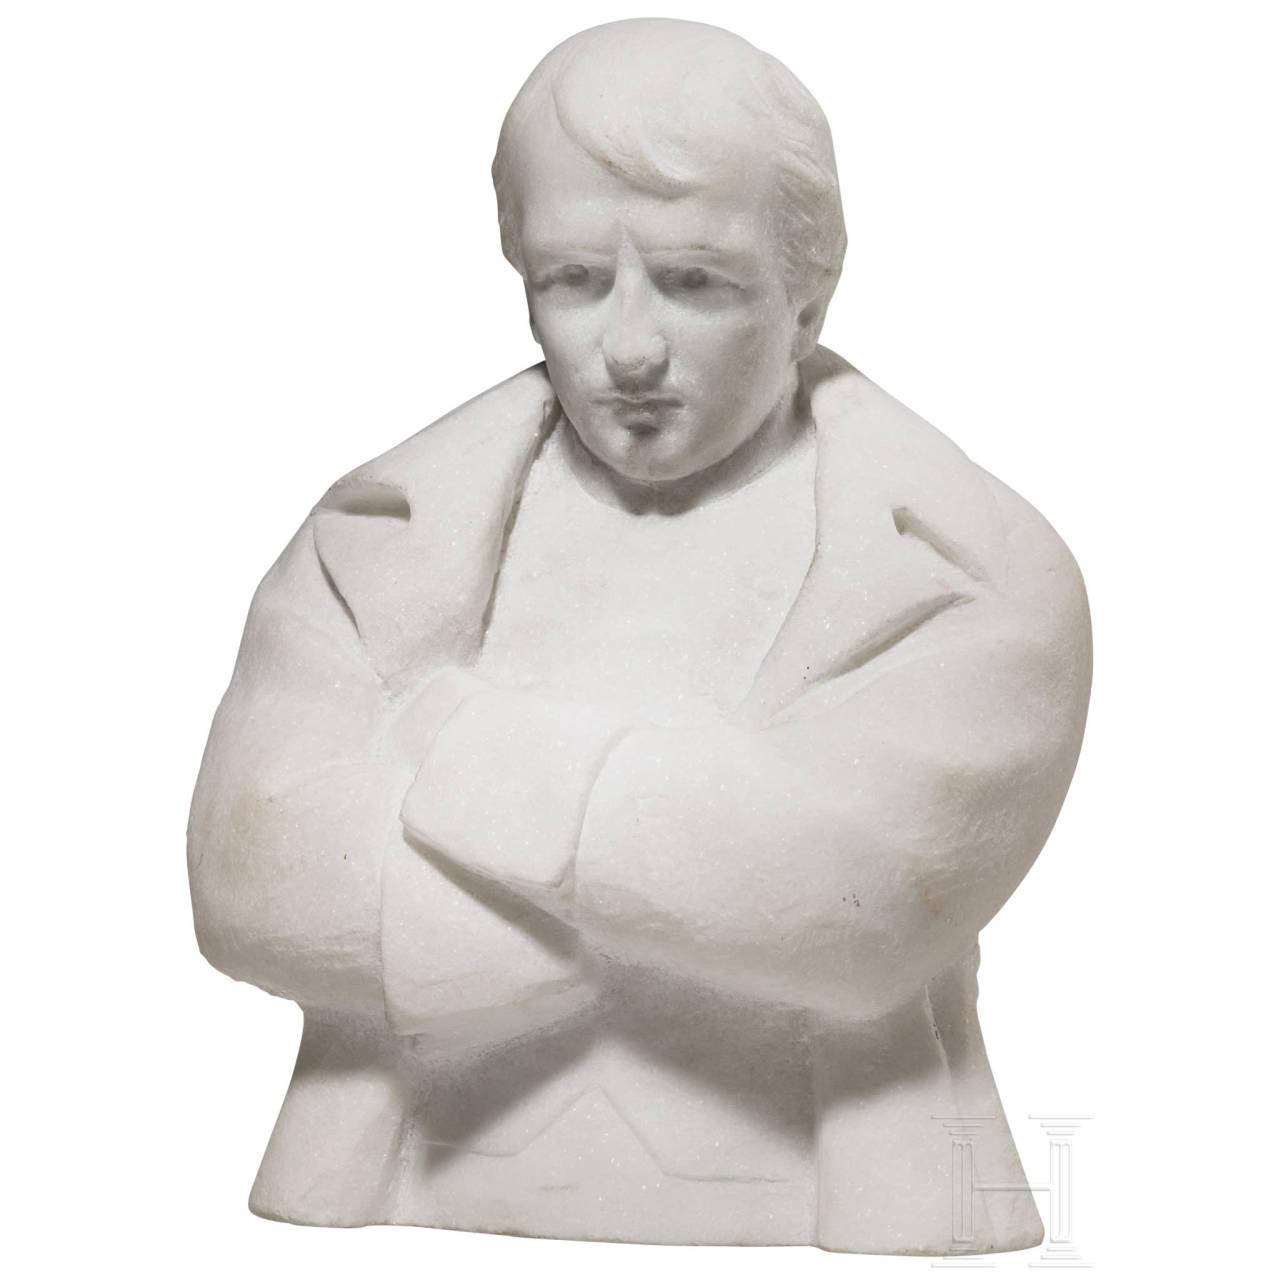 Heavy marble bust of Napoleon Bonaparte, 20th century